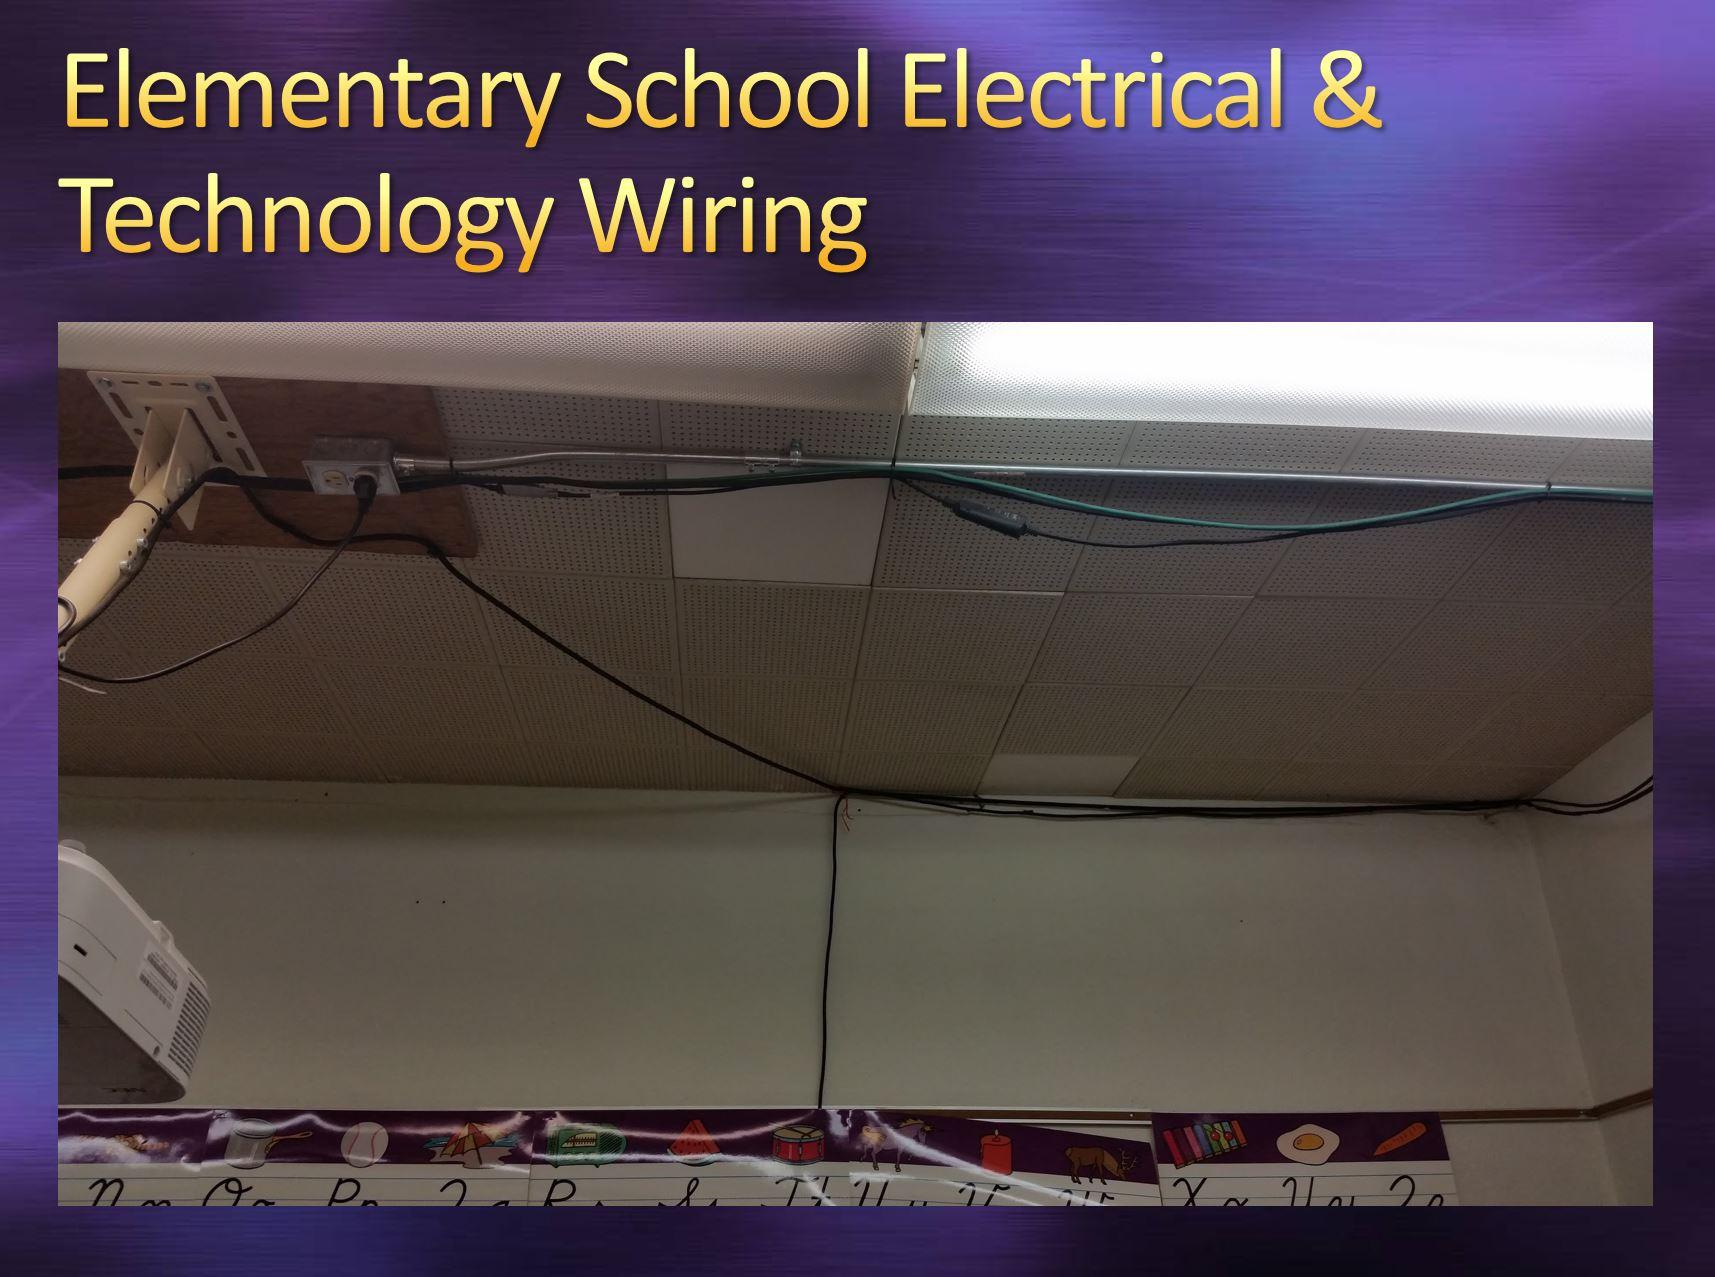 Elementary School Technology wiring